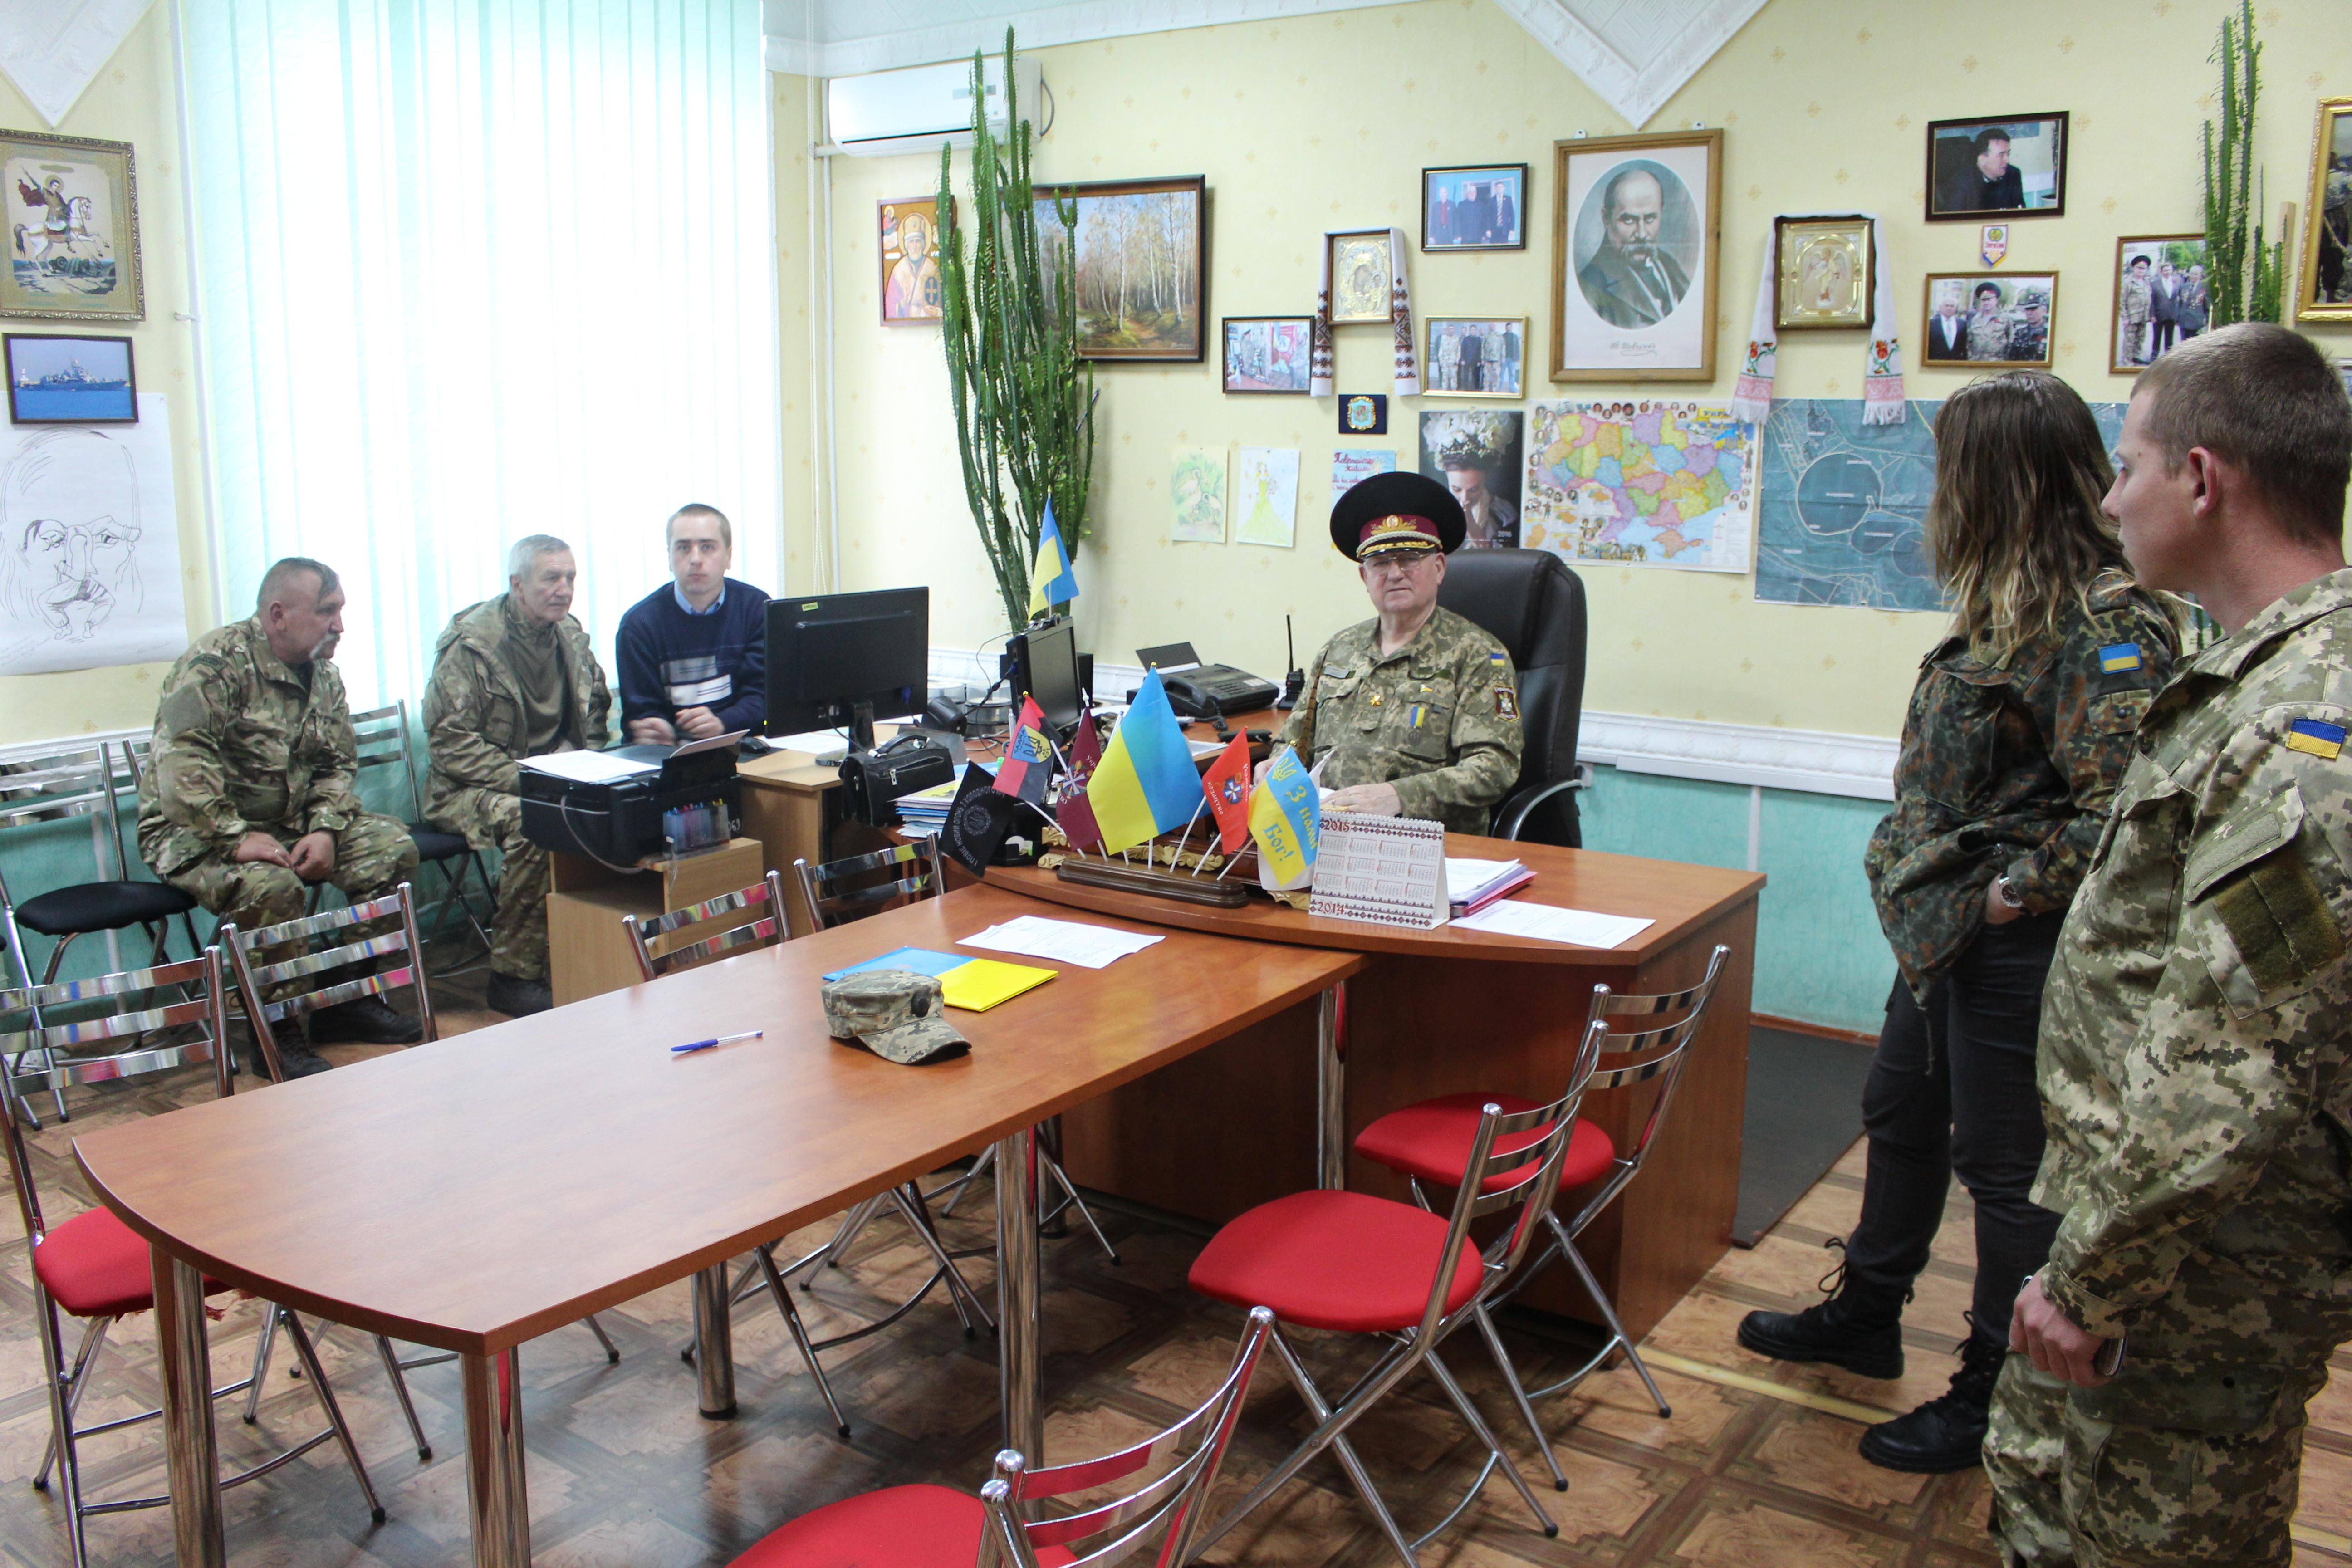 Office of Cossack commander Shchastya 26.04.2016 Luc Maffre